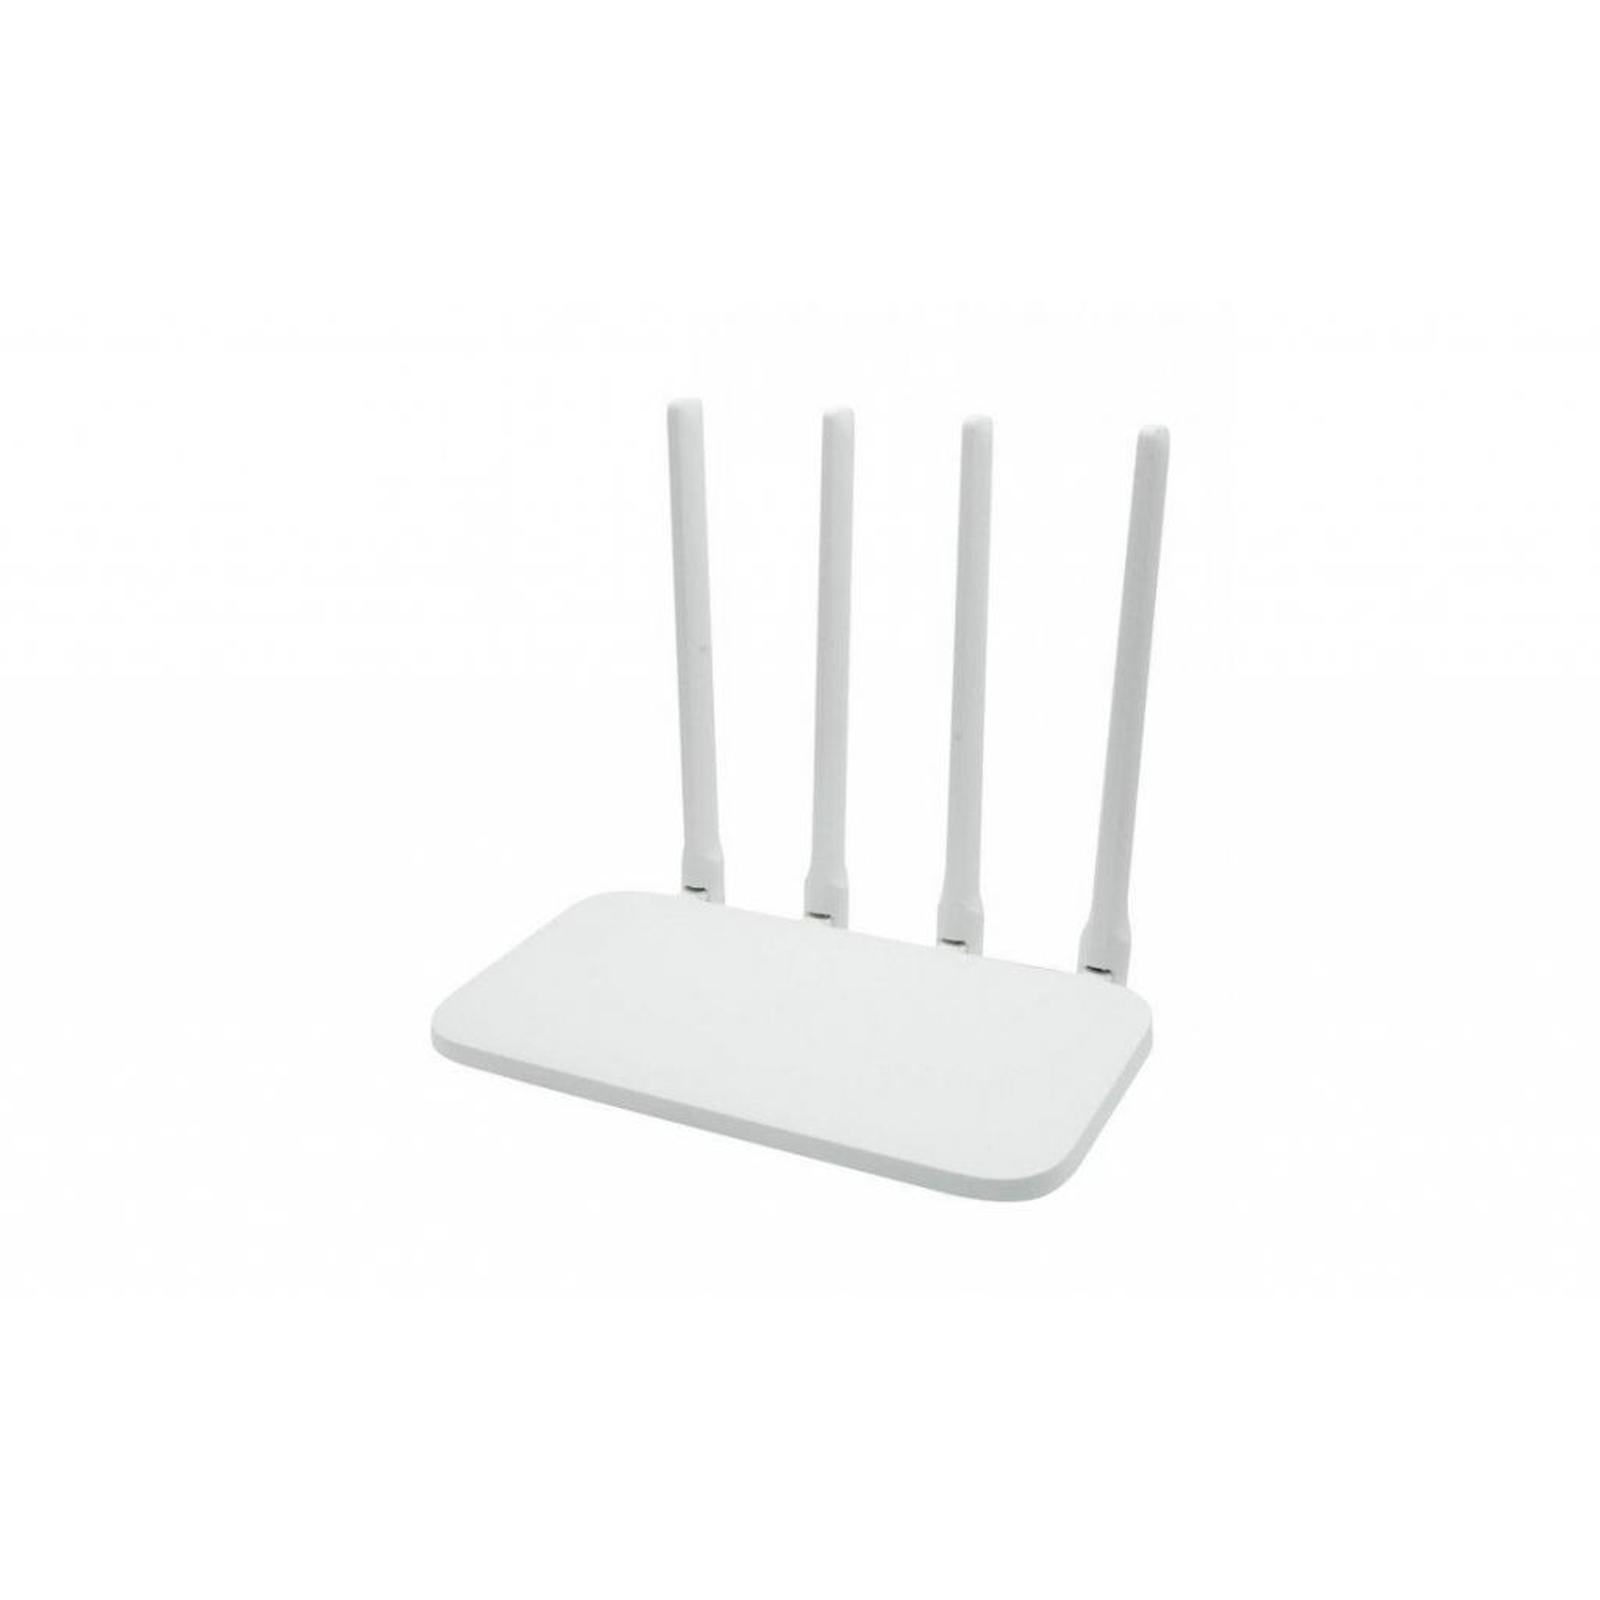 Маршрутизатор Xiaomi Mi Router 4A Giga Global зображення 3